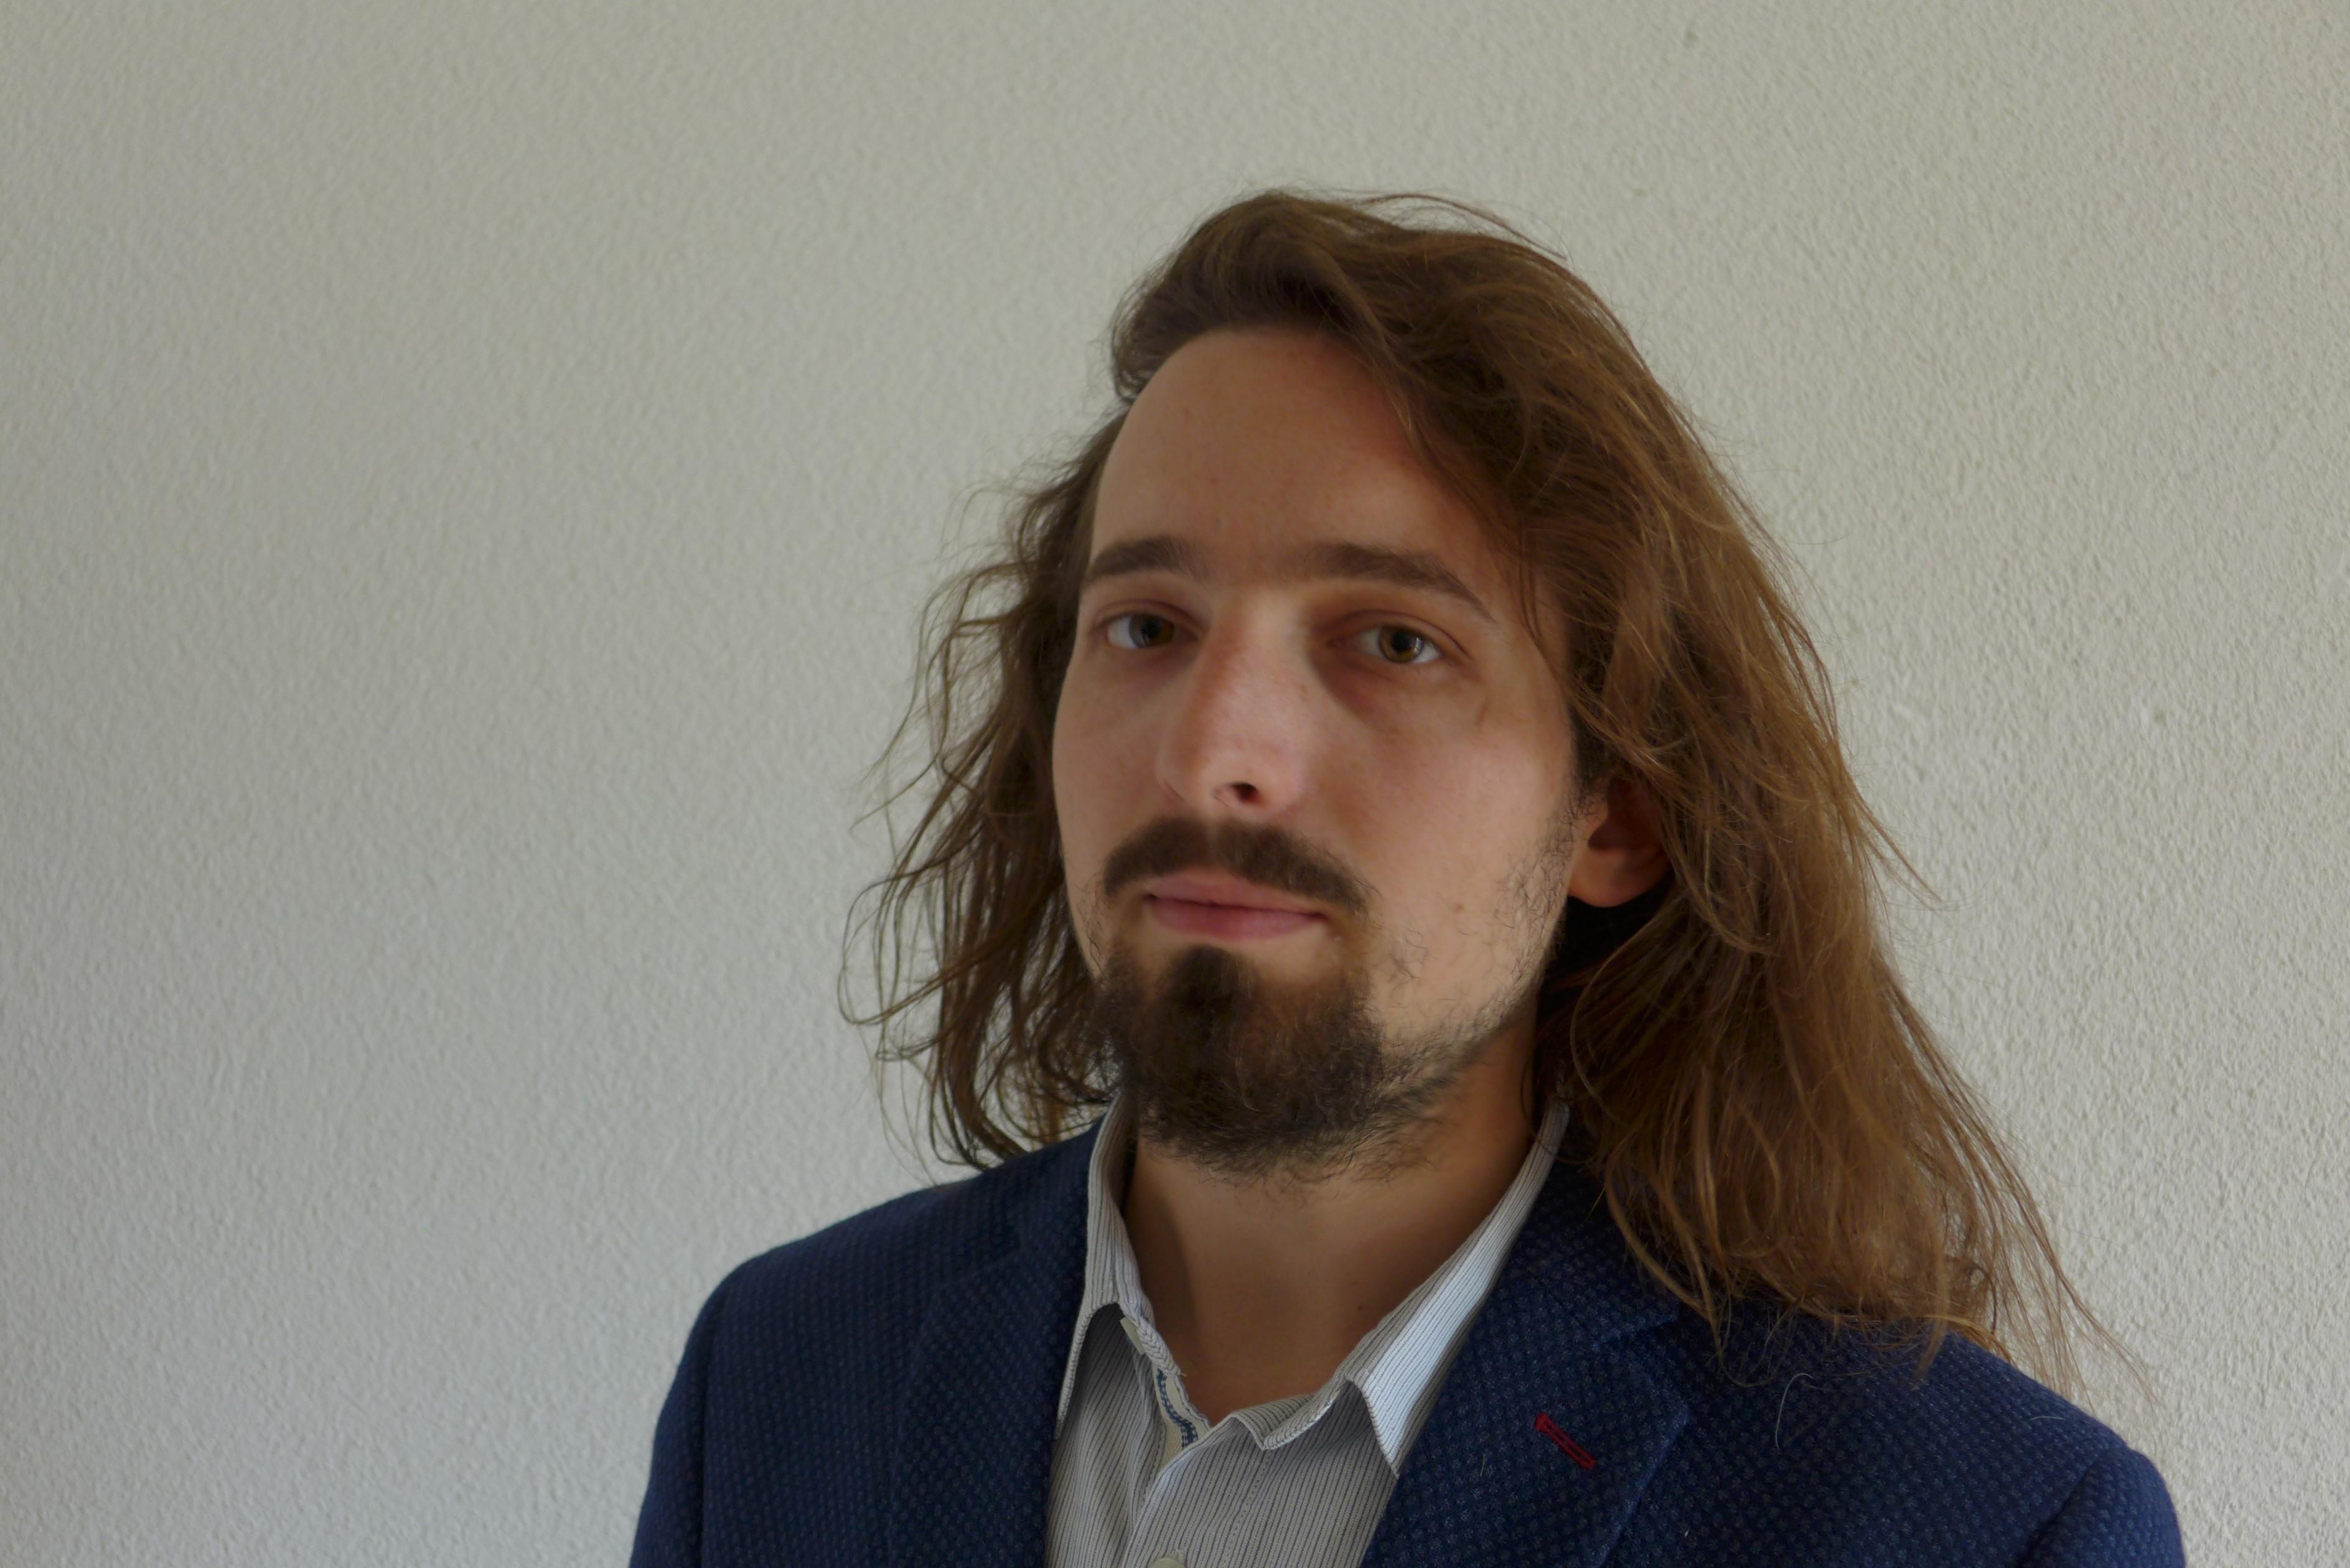 Lucas Forberger